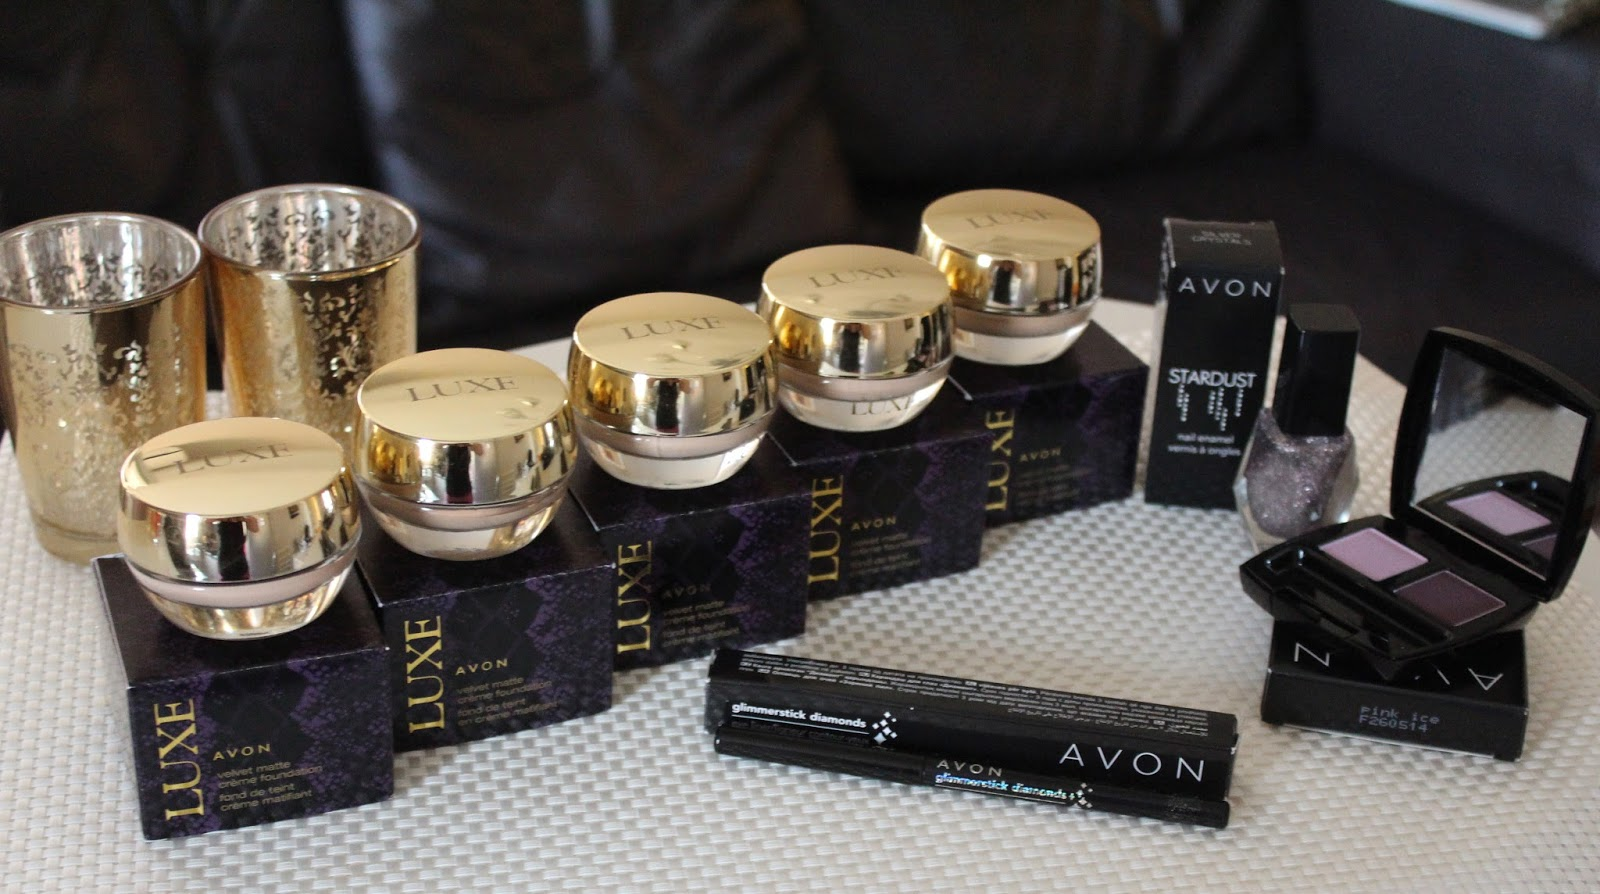 AVON Luxe Velvet Matte Creme Foundation (sve nijanse) + Look kreiran komplet Avon šminkom